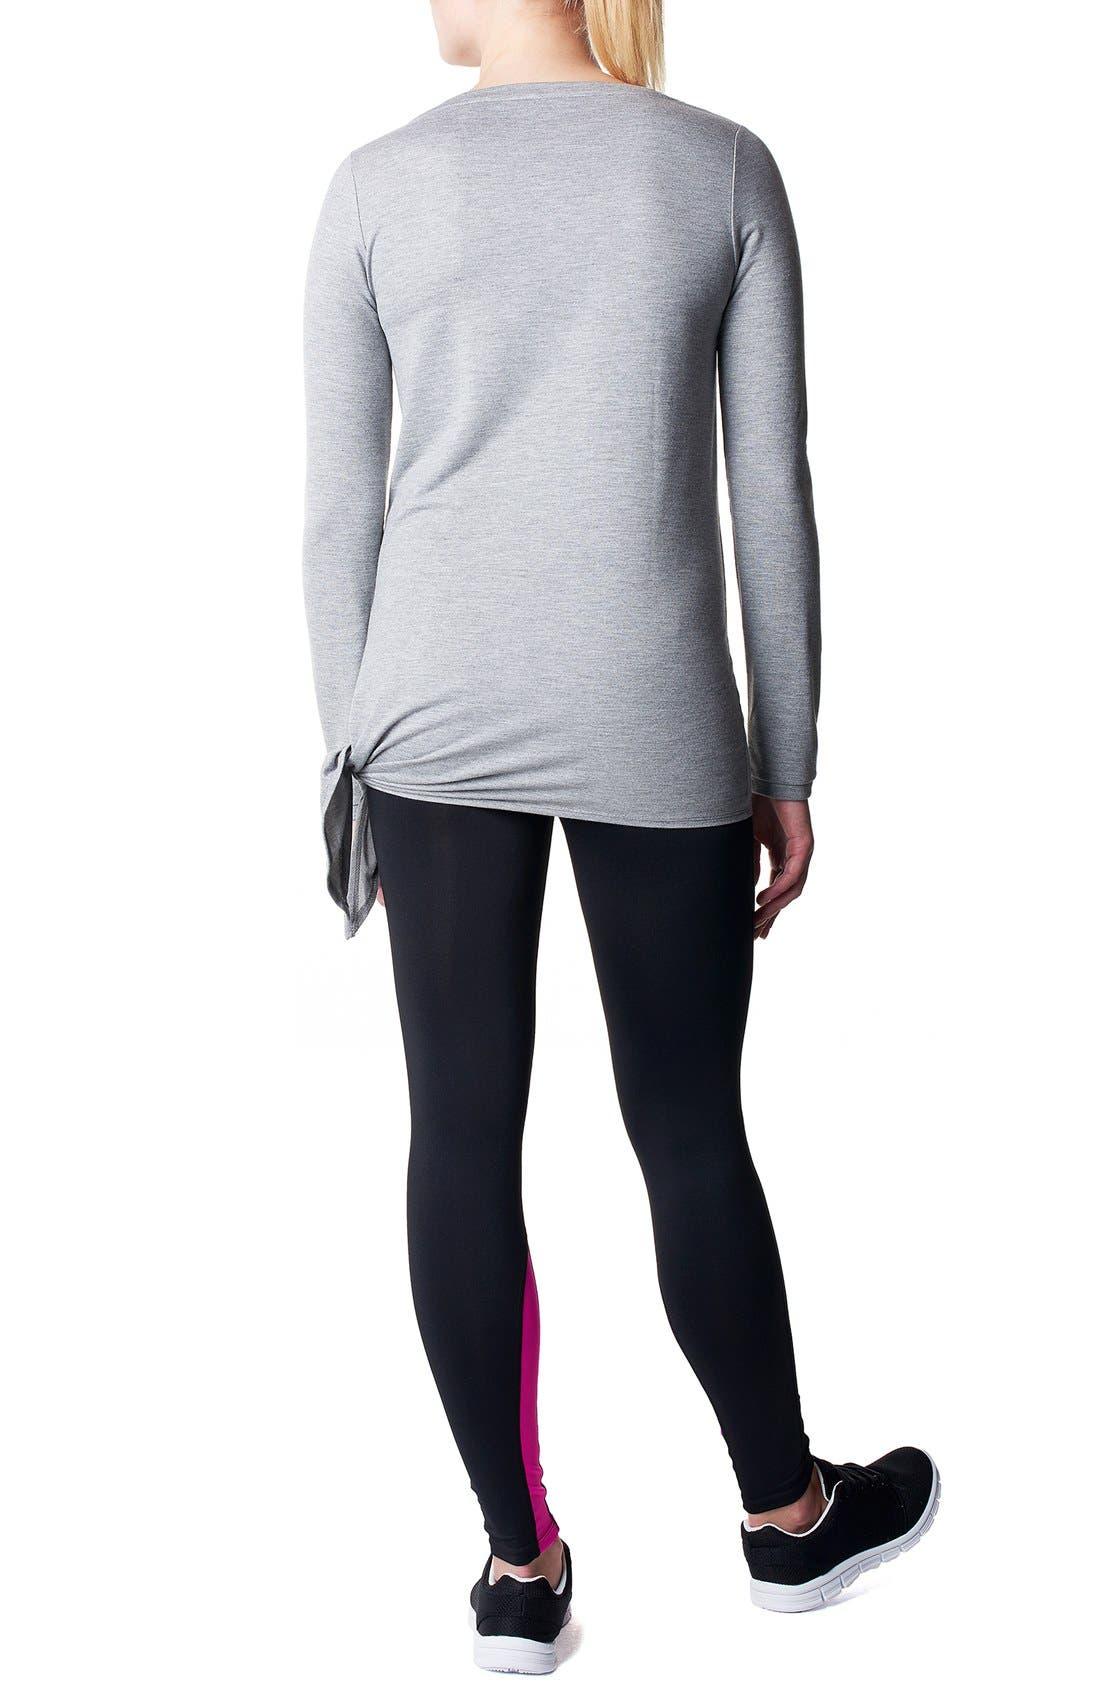 'Heather' Athletic Long Sleeve Maternity Top,                             Alternate thumbnail 2, color,                             Grey Melange